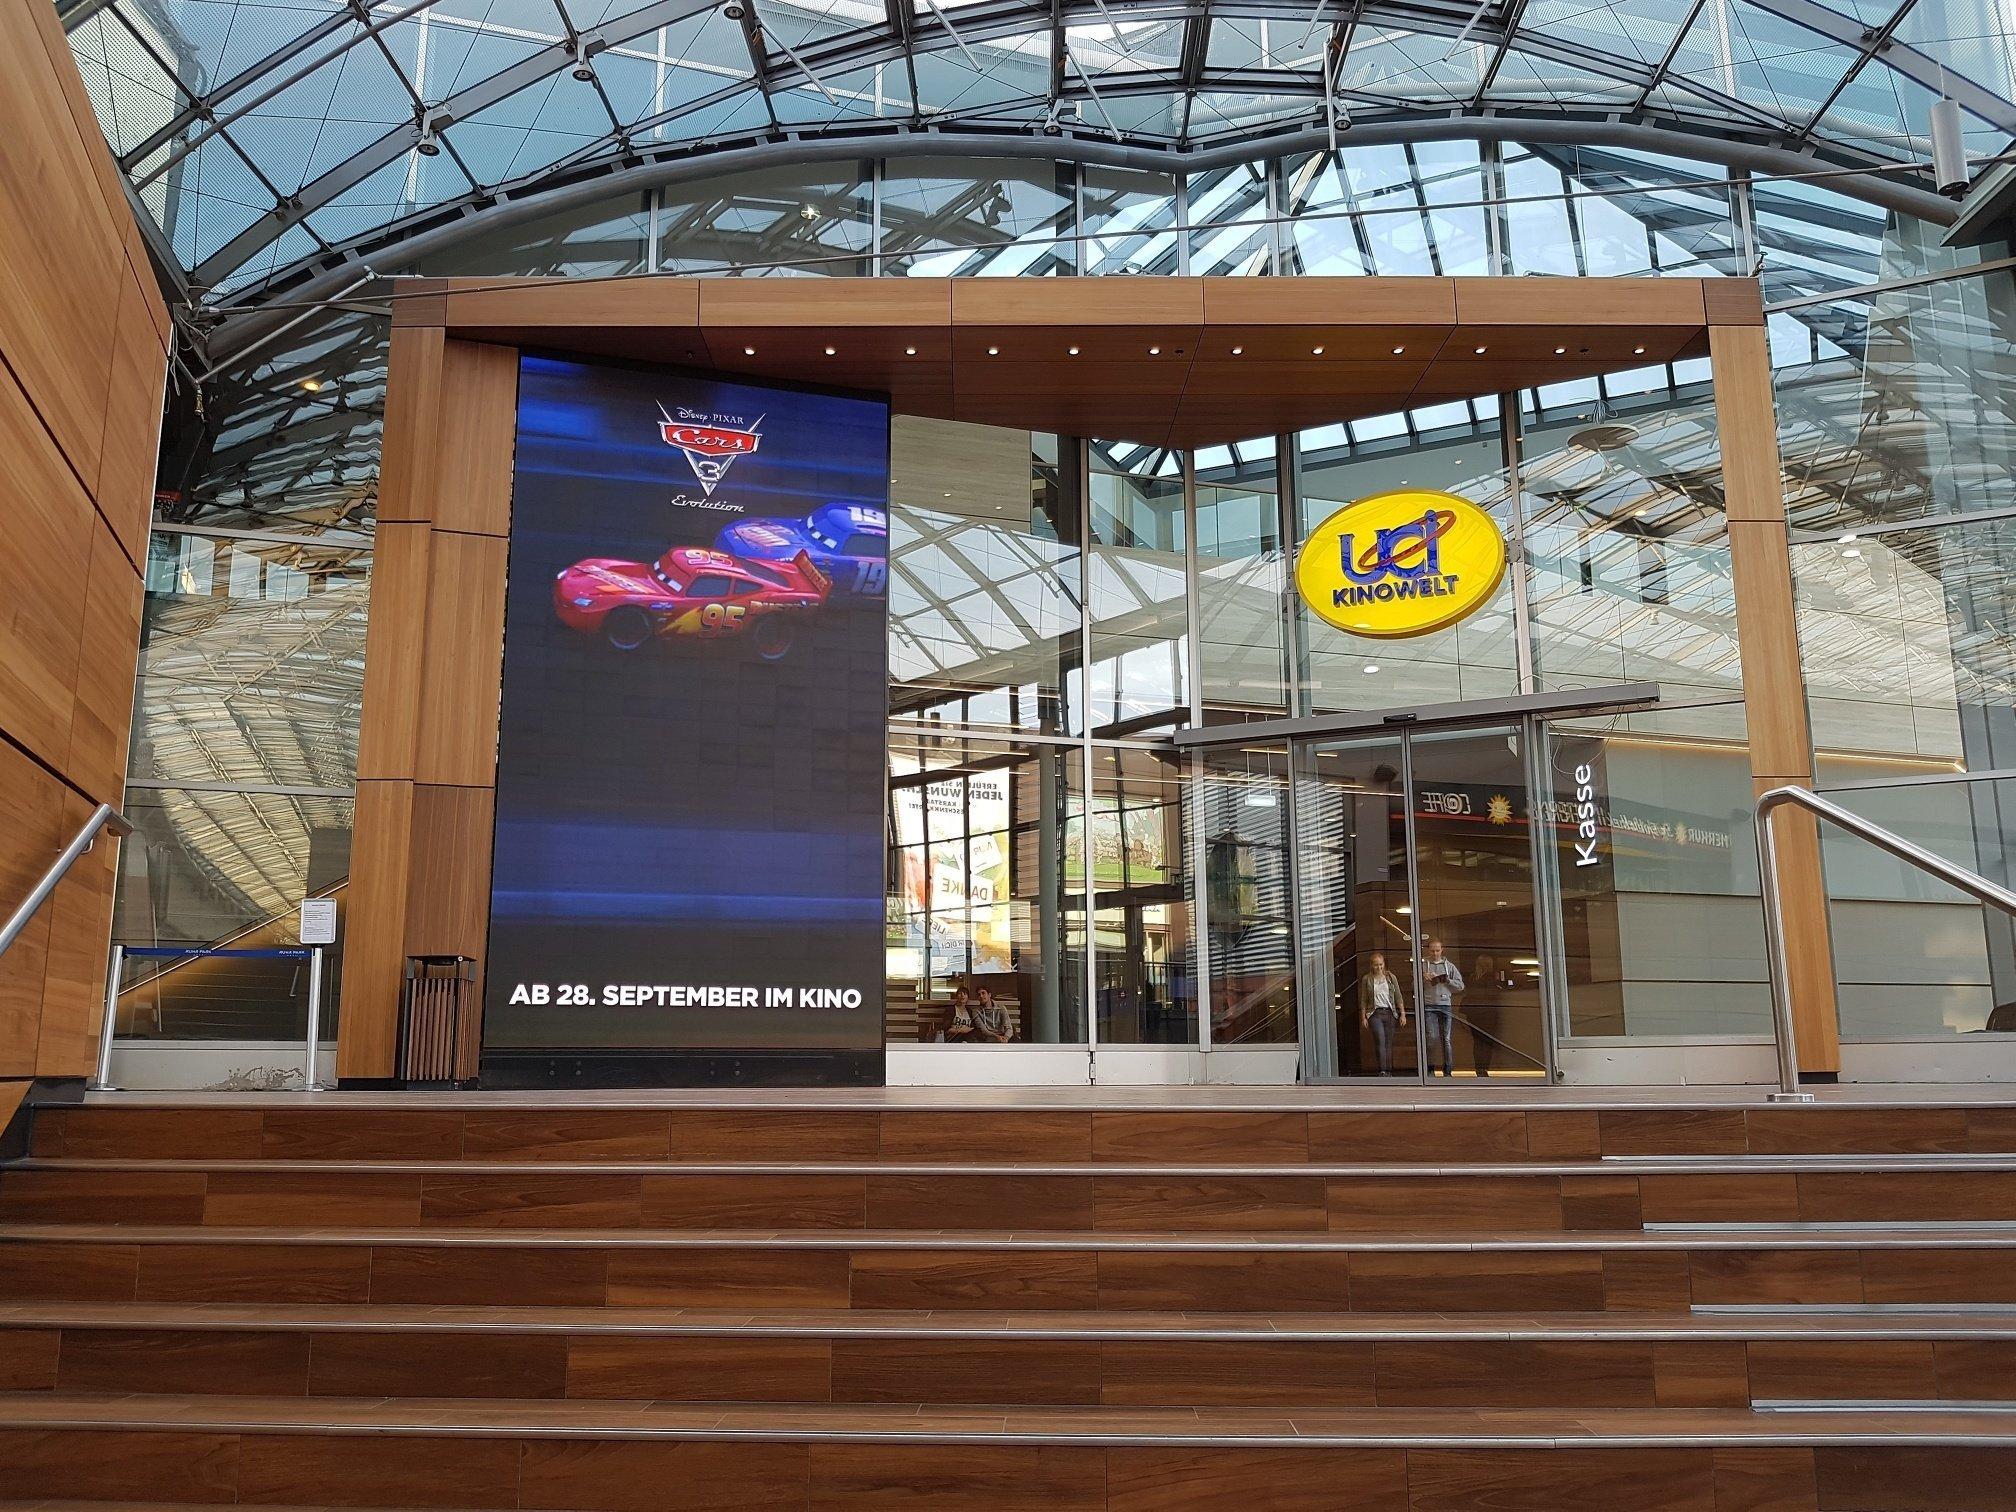 Uci Kinowelt Düsseldorf Düsseldorf